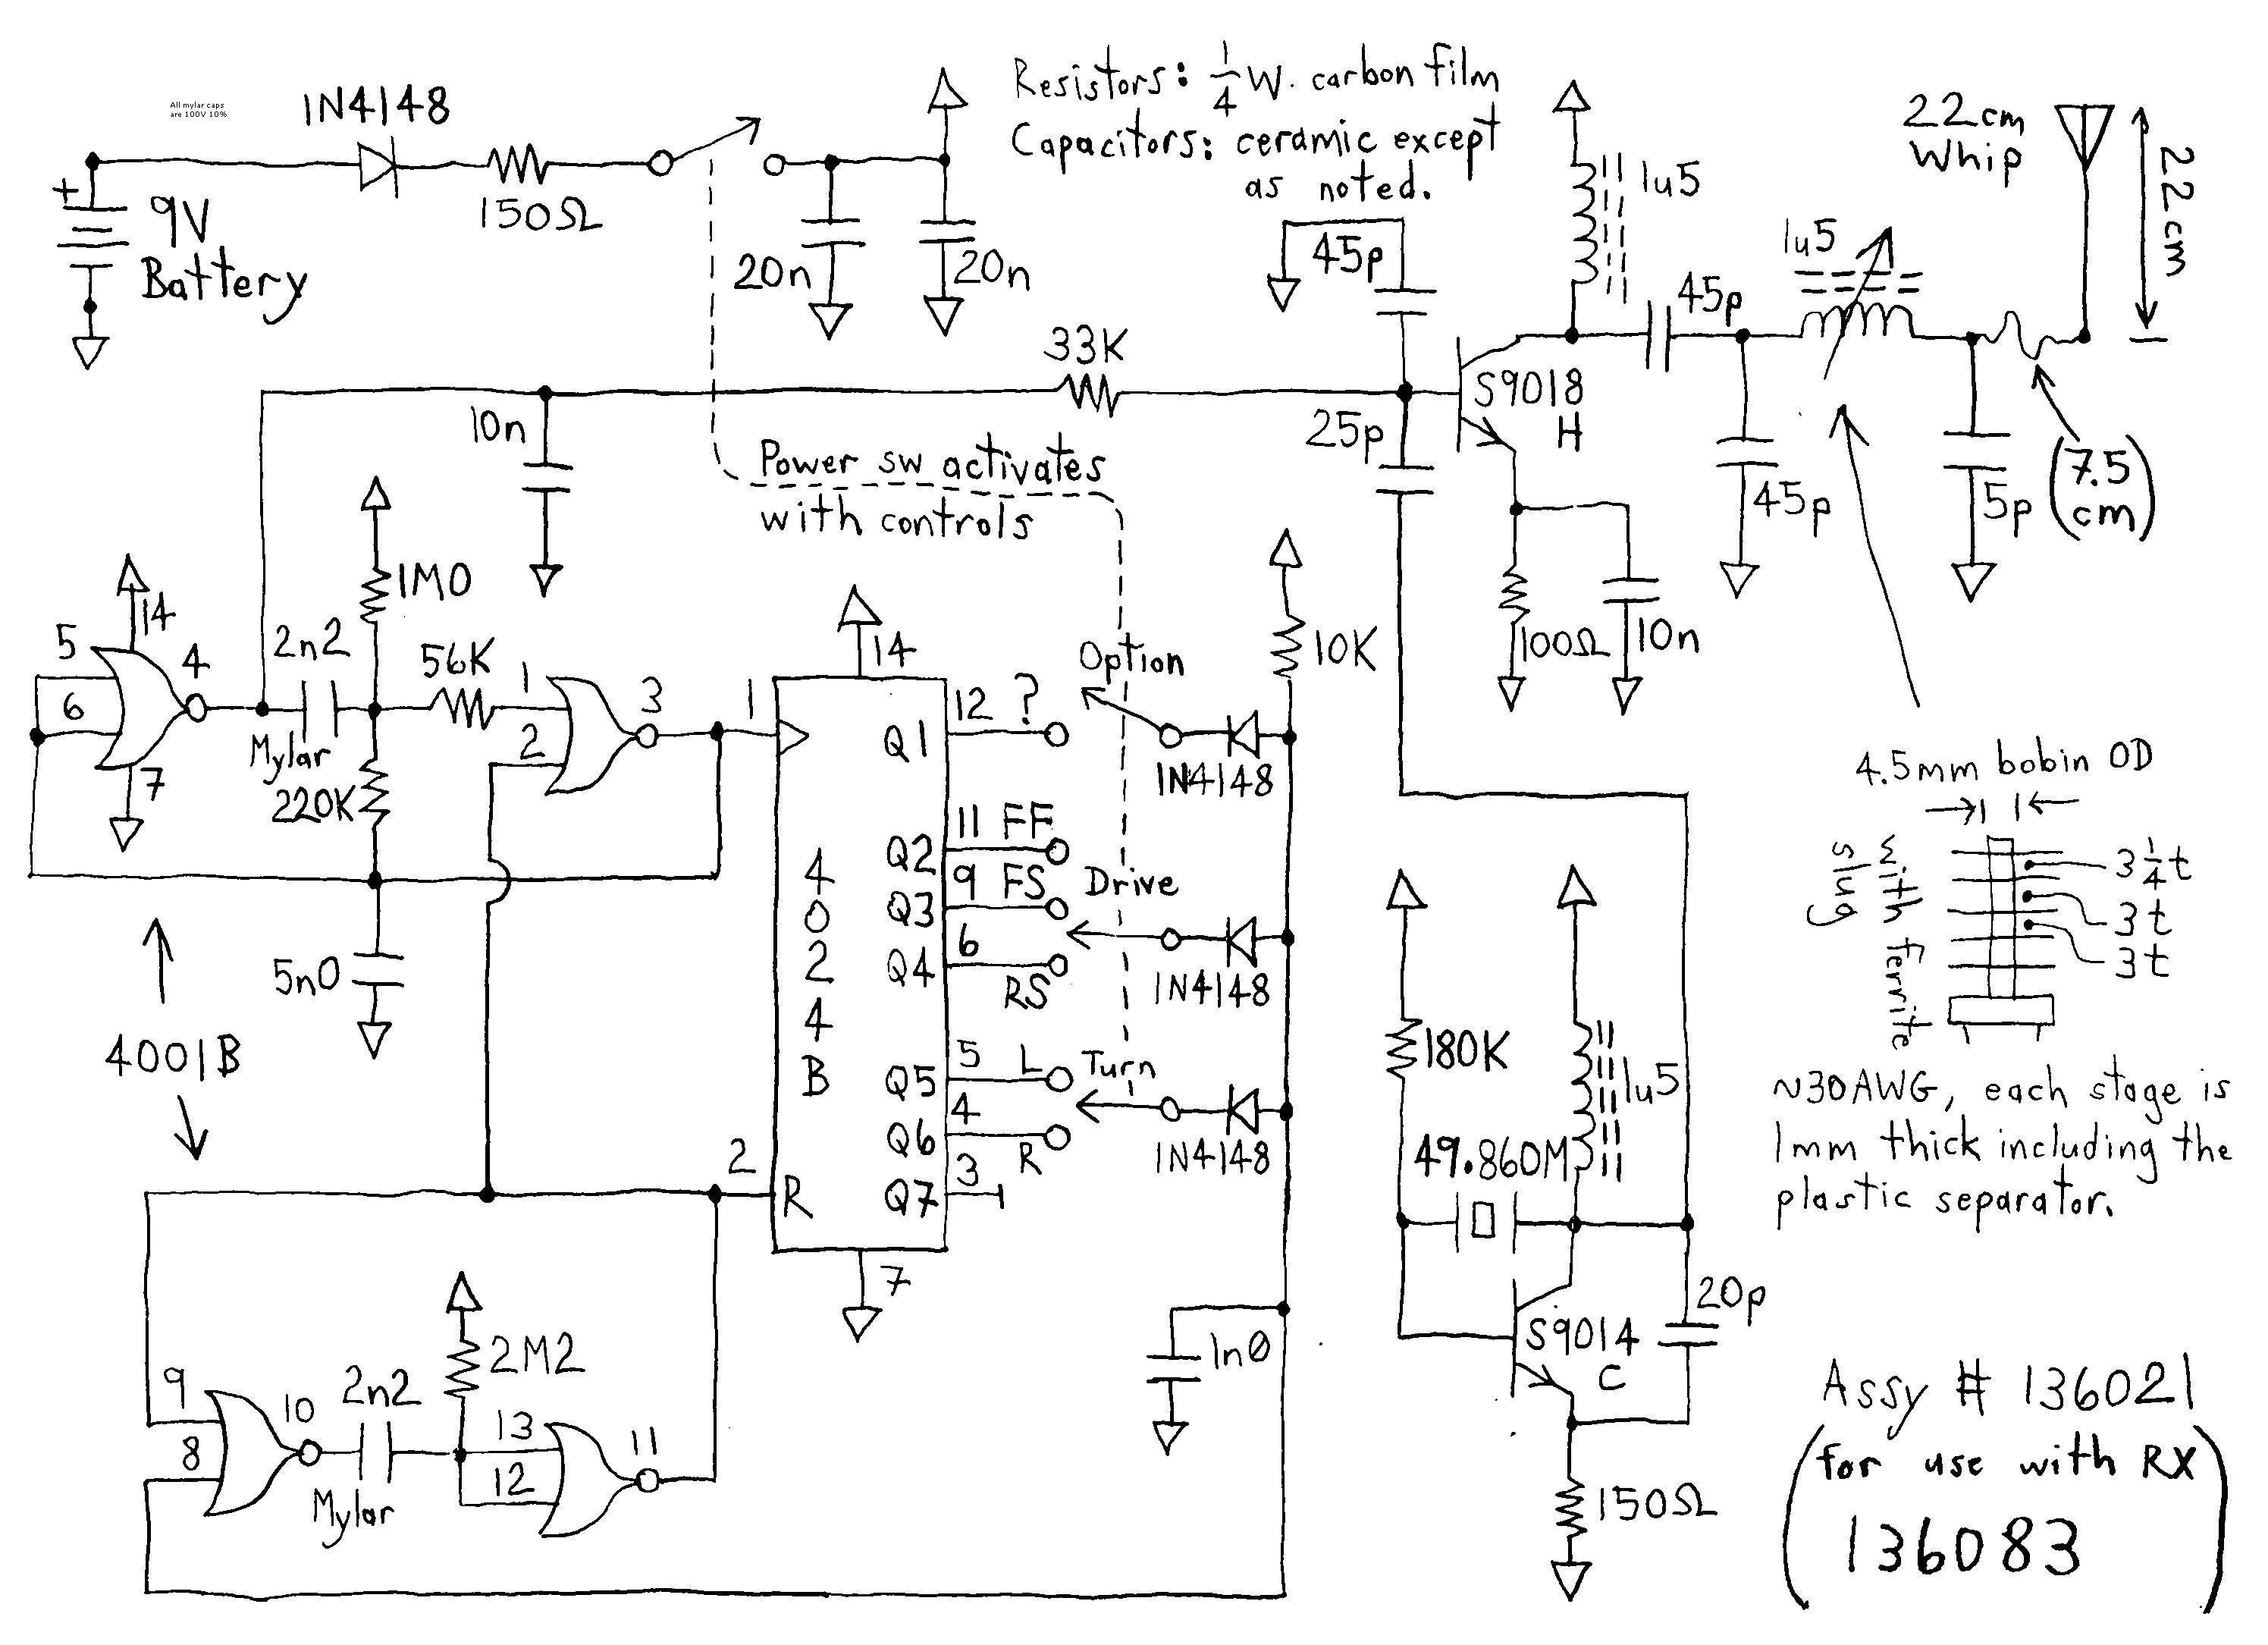 1996 Gas Ezgo Wire Diagram 5c817d 50a Twist Plug Wiring Diagram Of 1996 Gas Ezgo Wire Diagram